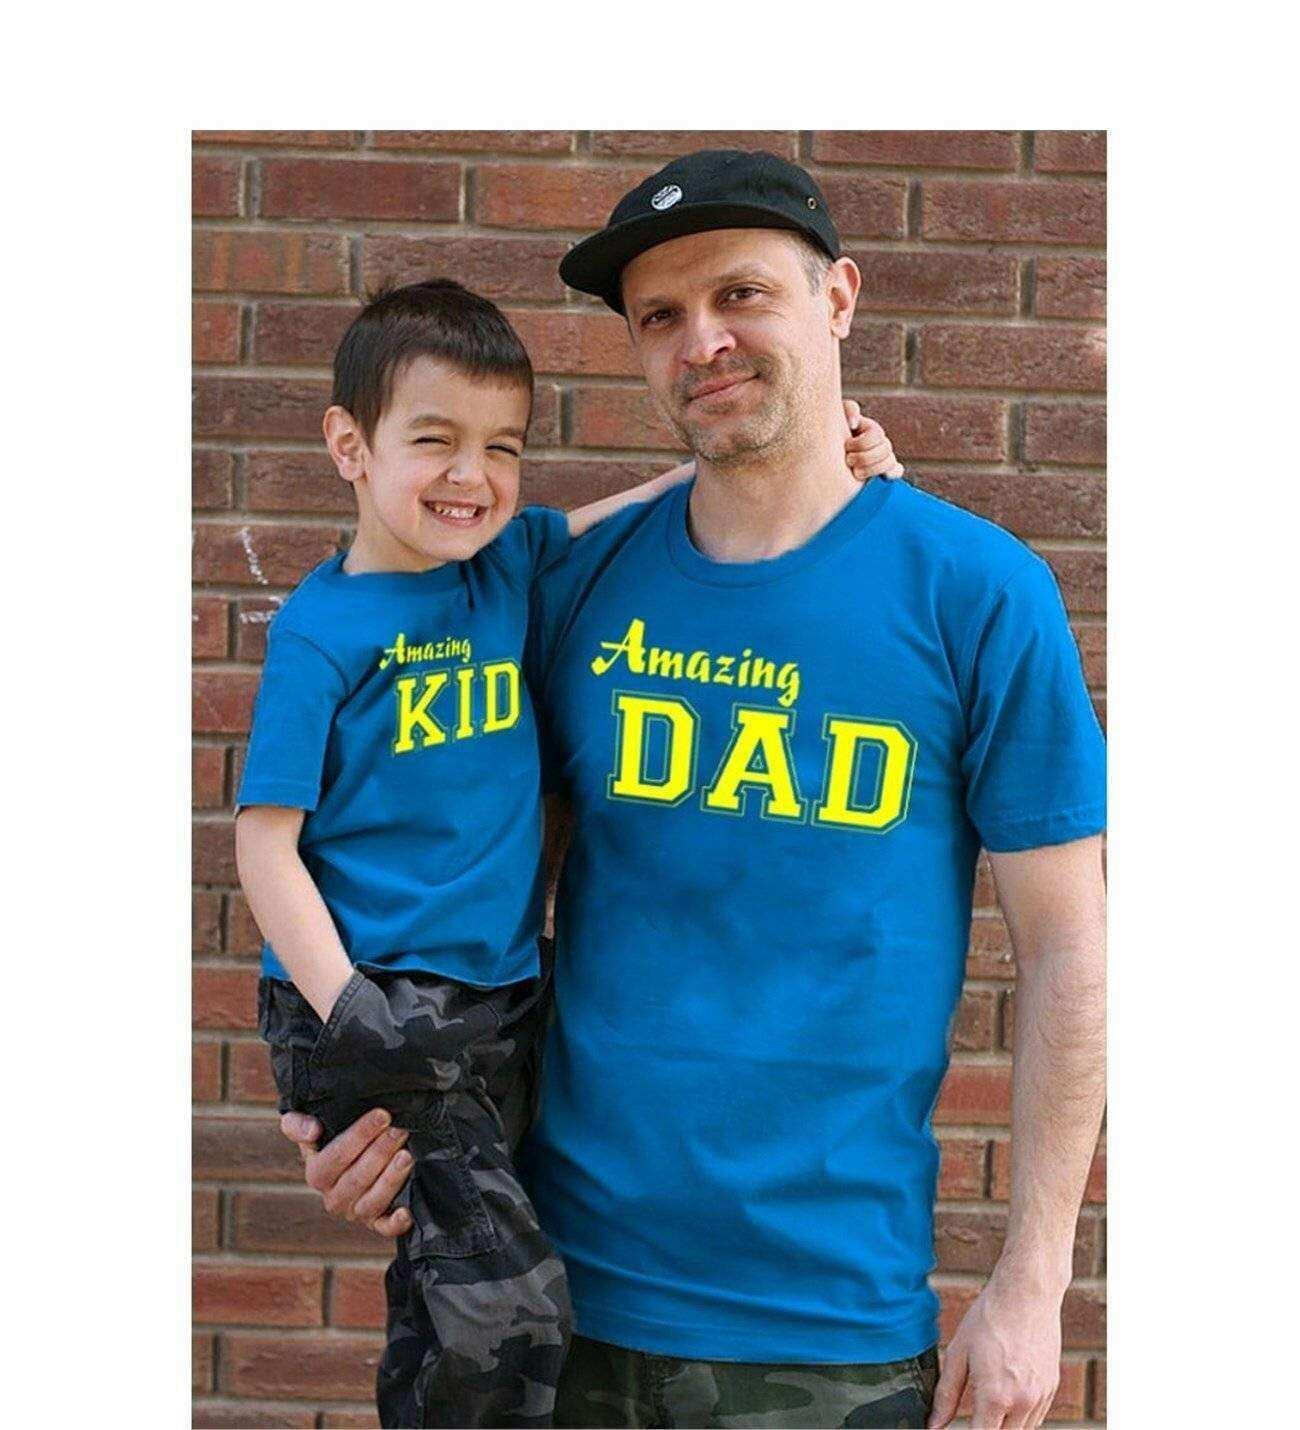 Tshirthane - Amazing Dad,Amazing Kid Baba Oğul Tshirt Mavi Tişört